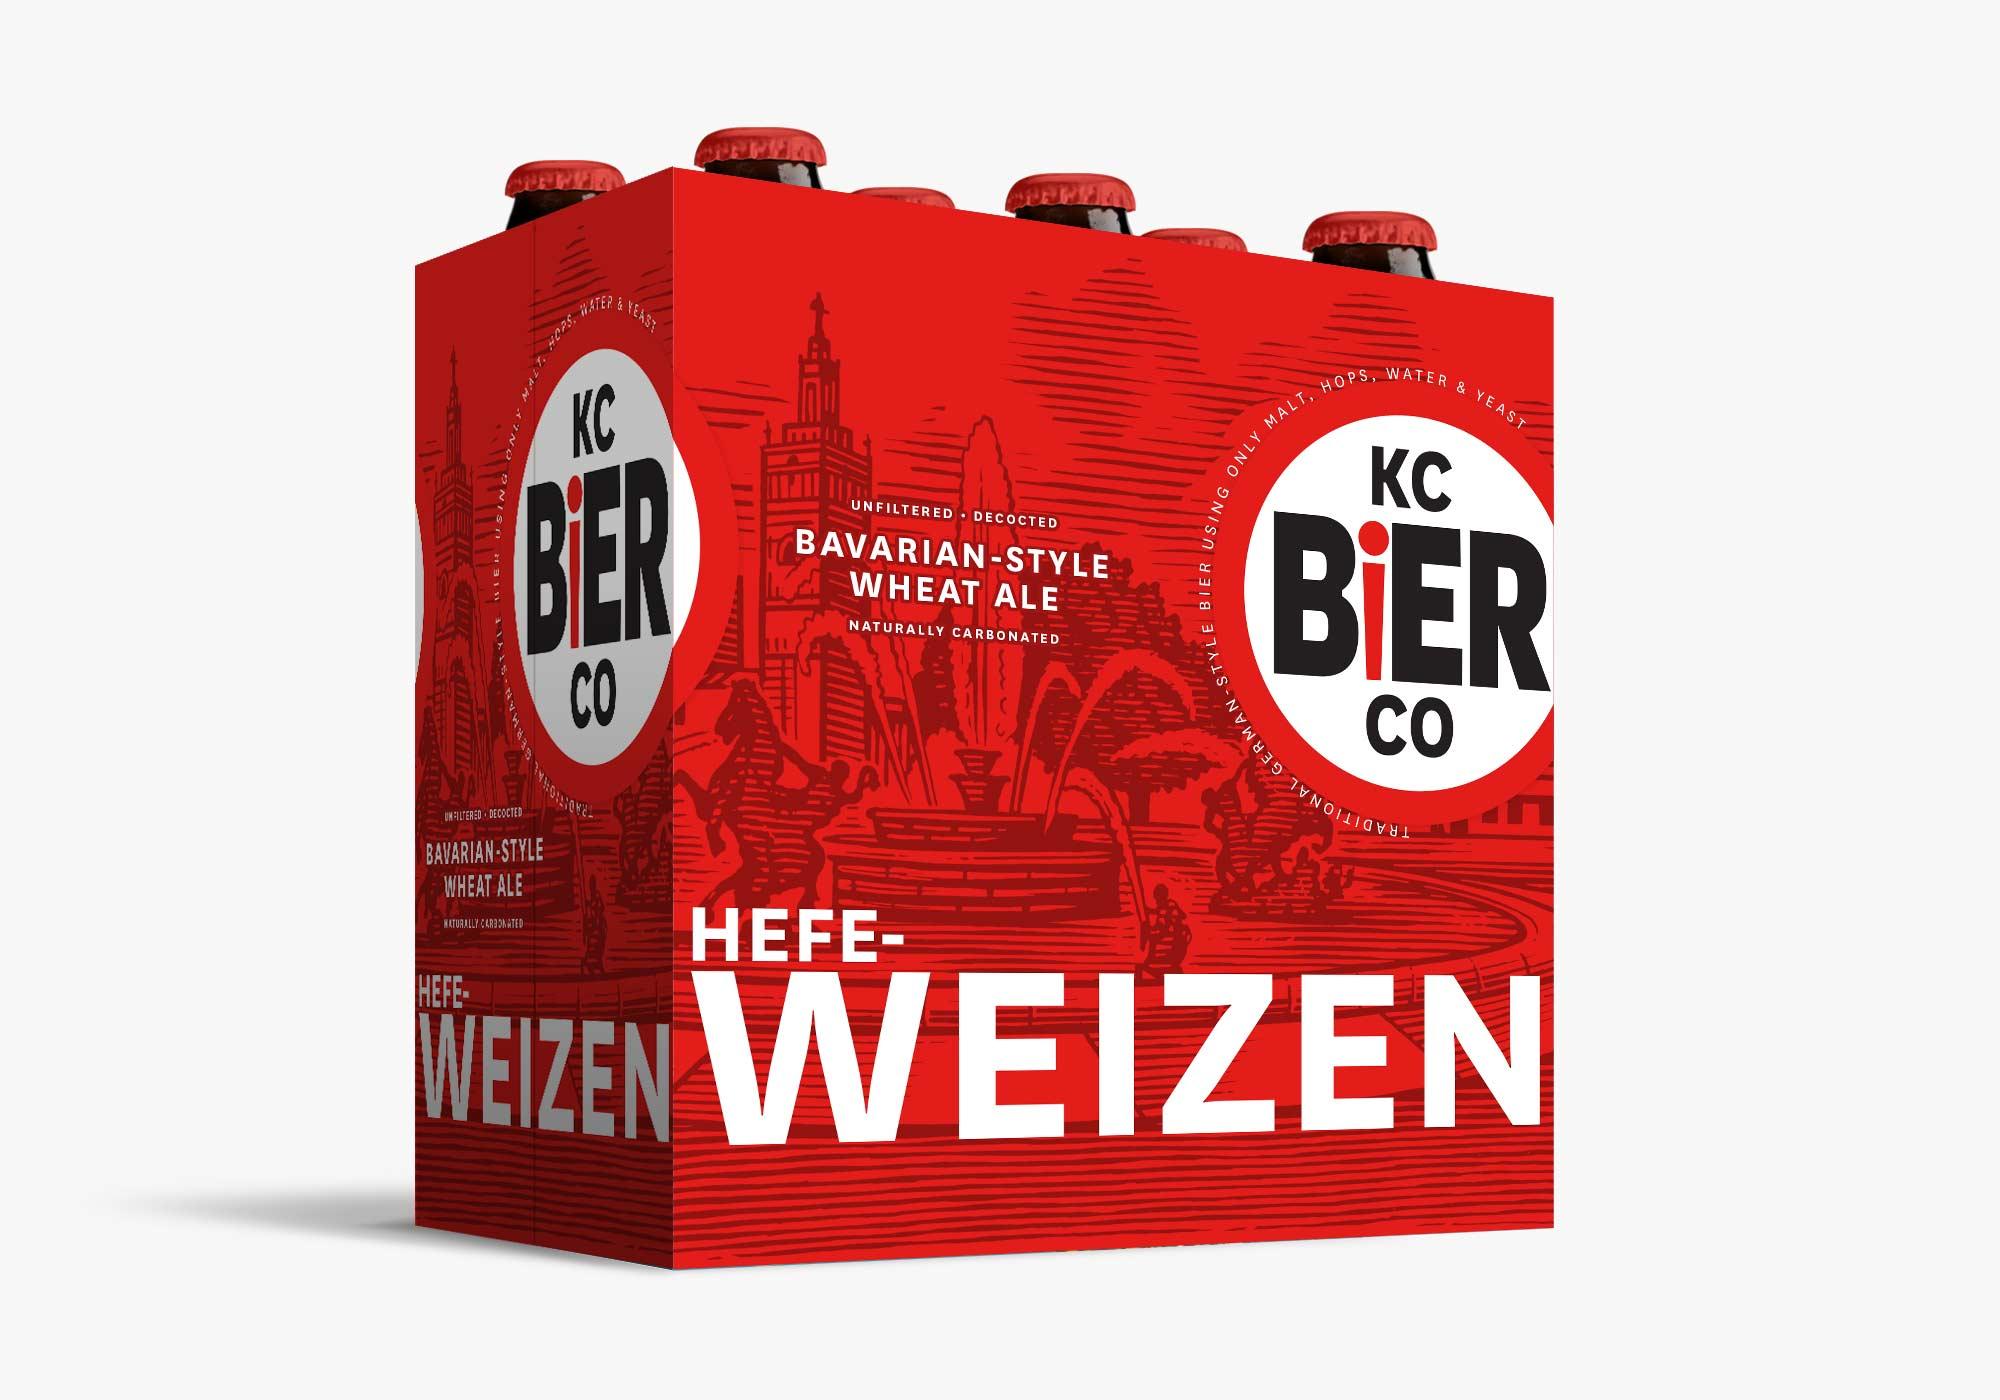 KCBier-Label-Design-Branding_Hefeweizen.jpg